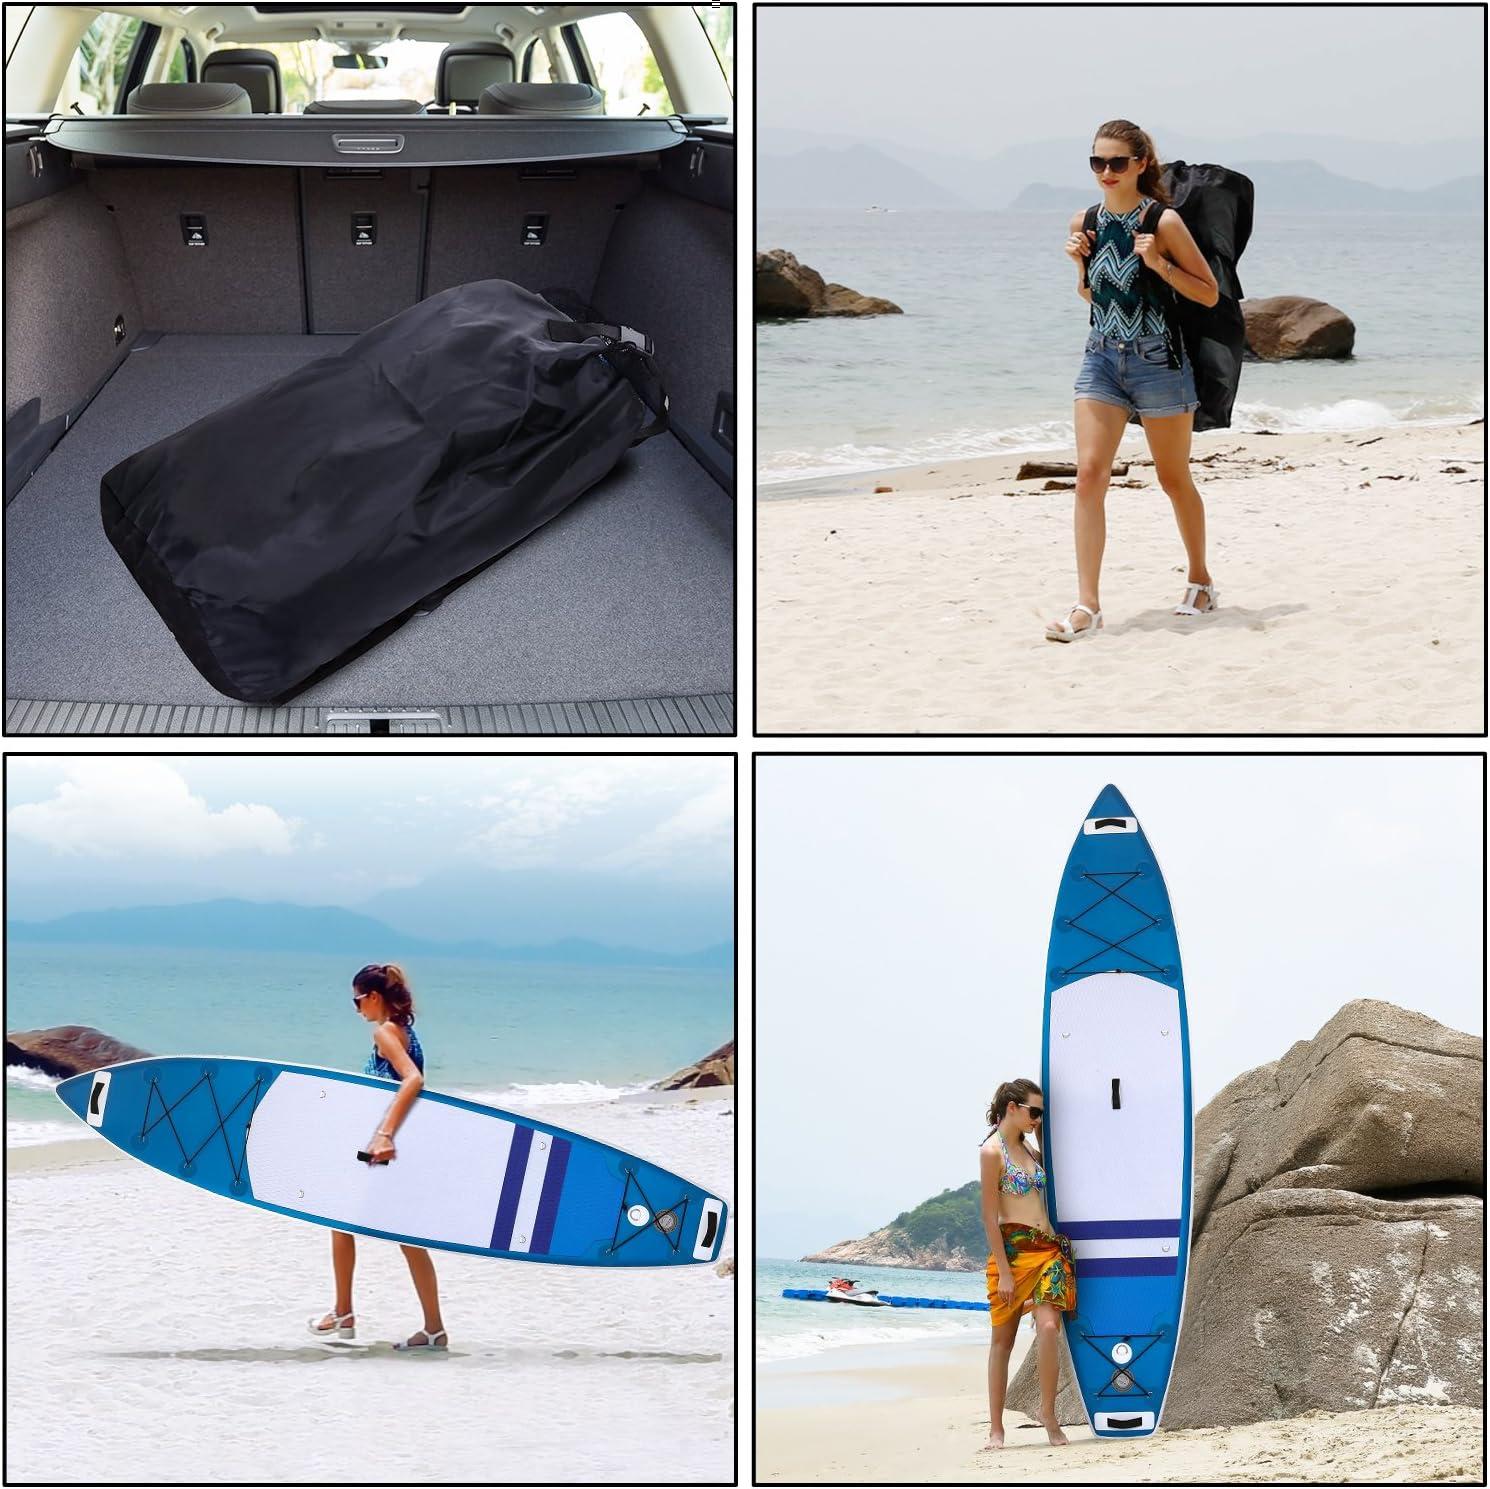 Funda Plegable Kit de Reparaci/ón Mochila Tabla Paddle Surf Hinchable para Principiantes con Bomba de Acci/ón Doble